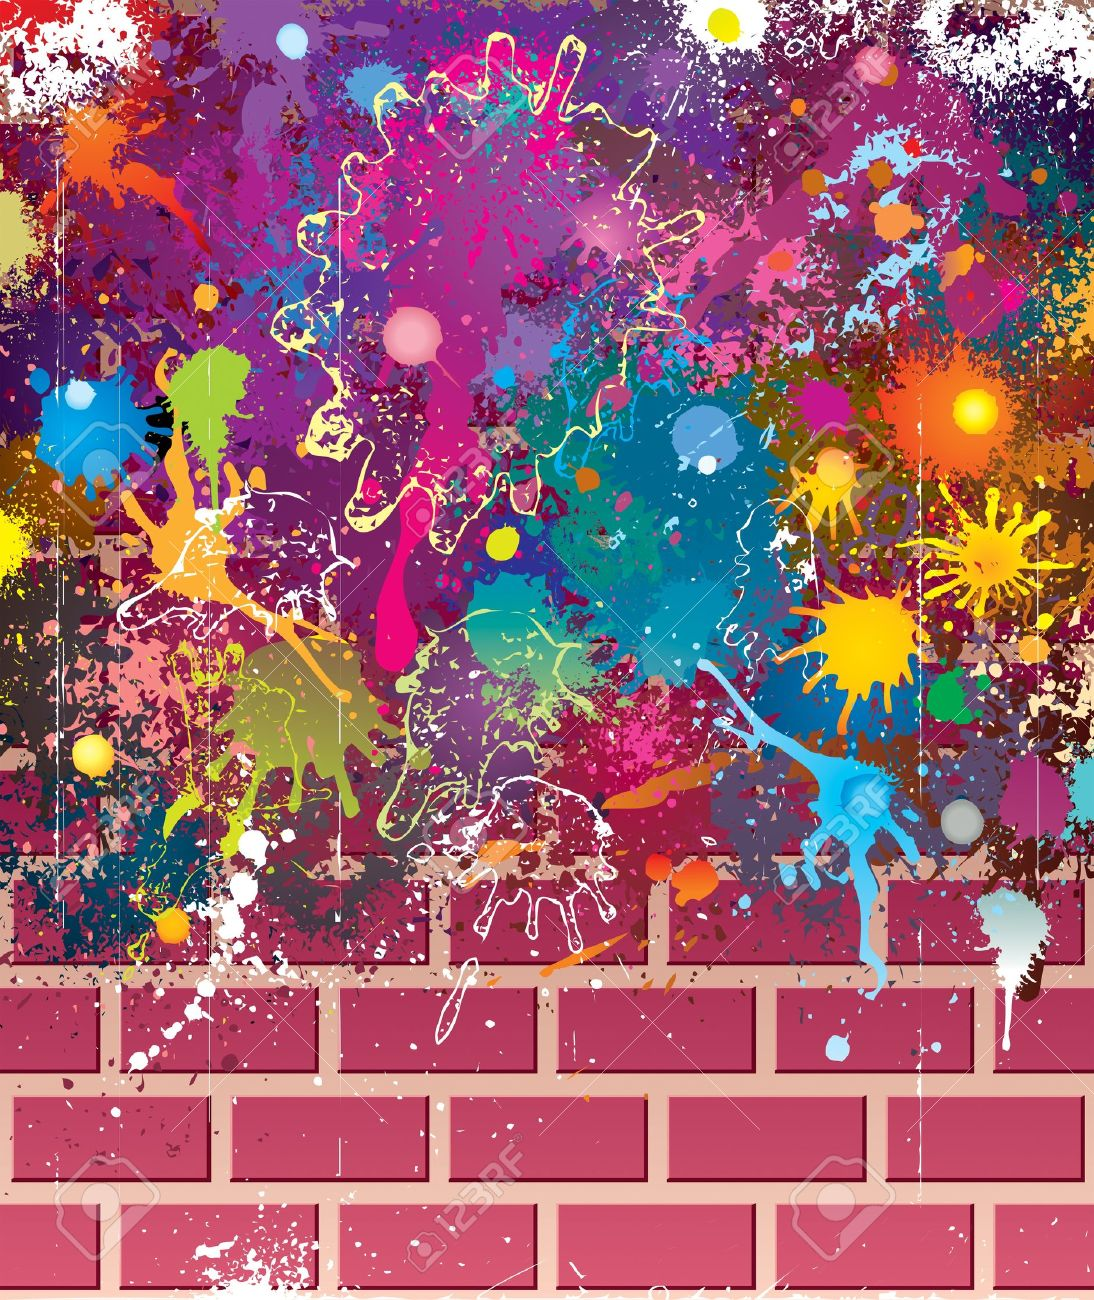 Graffiti wall vector free - Splatter Colors On Brick Wall Stock Vector 9850731